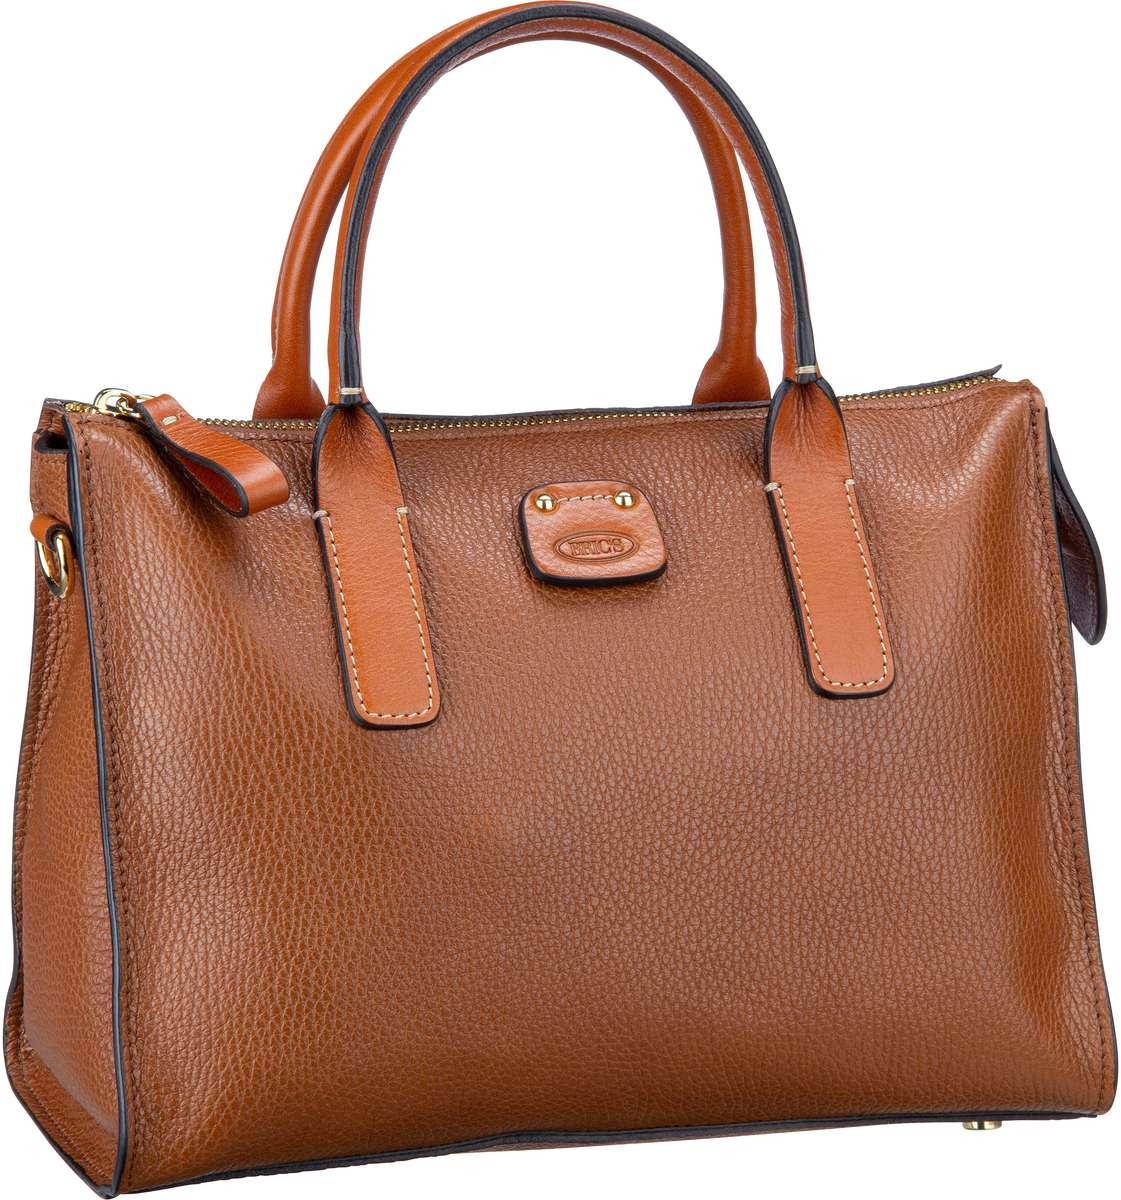 's Handtasche Duomo Damentasche 3299 Cognac